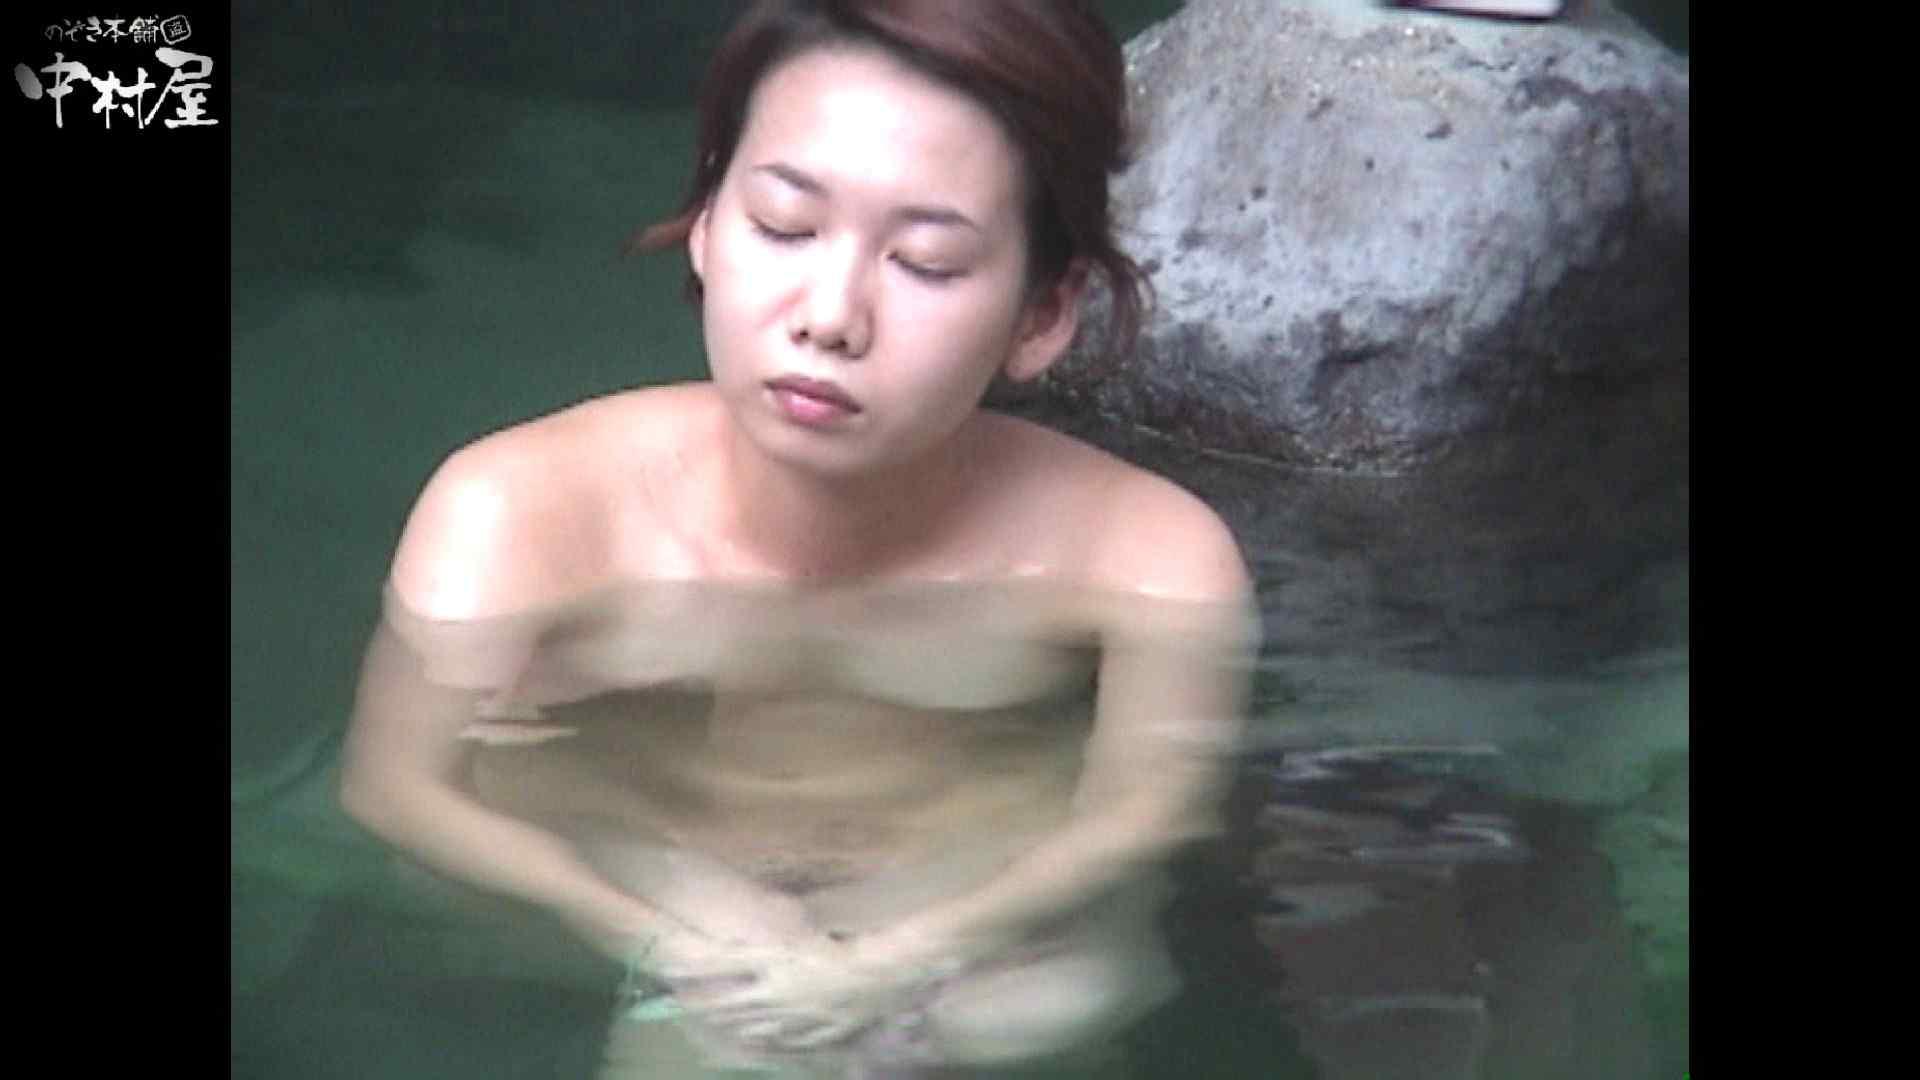 Aquaな露天風呂Vol.951 盗撮映像  93Pix 46